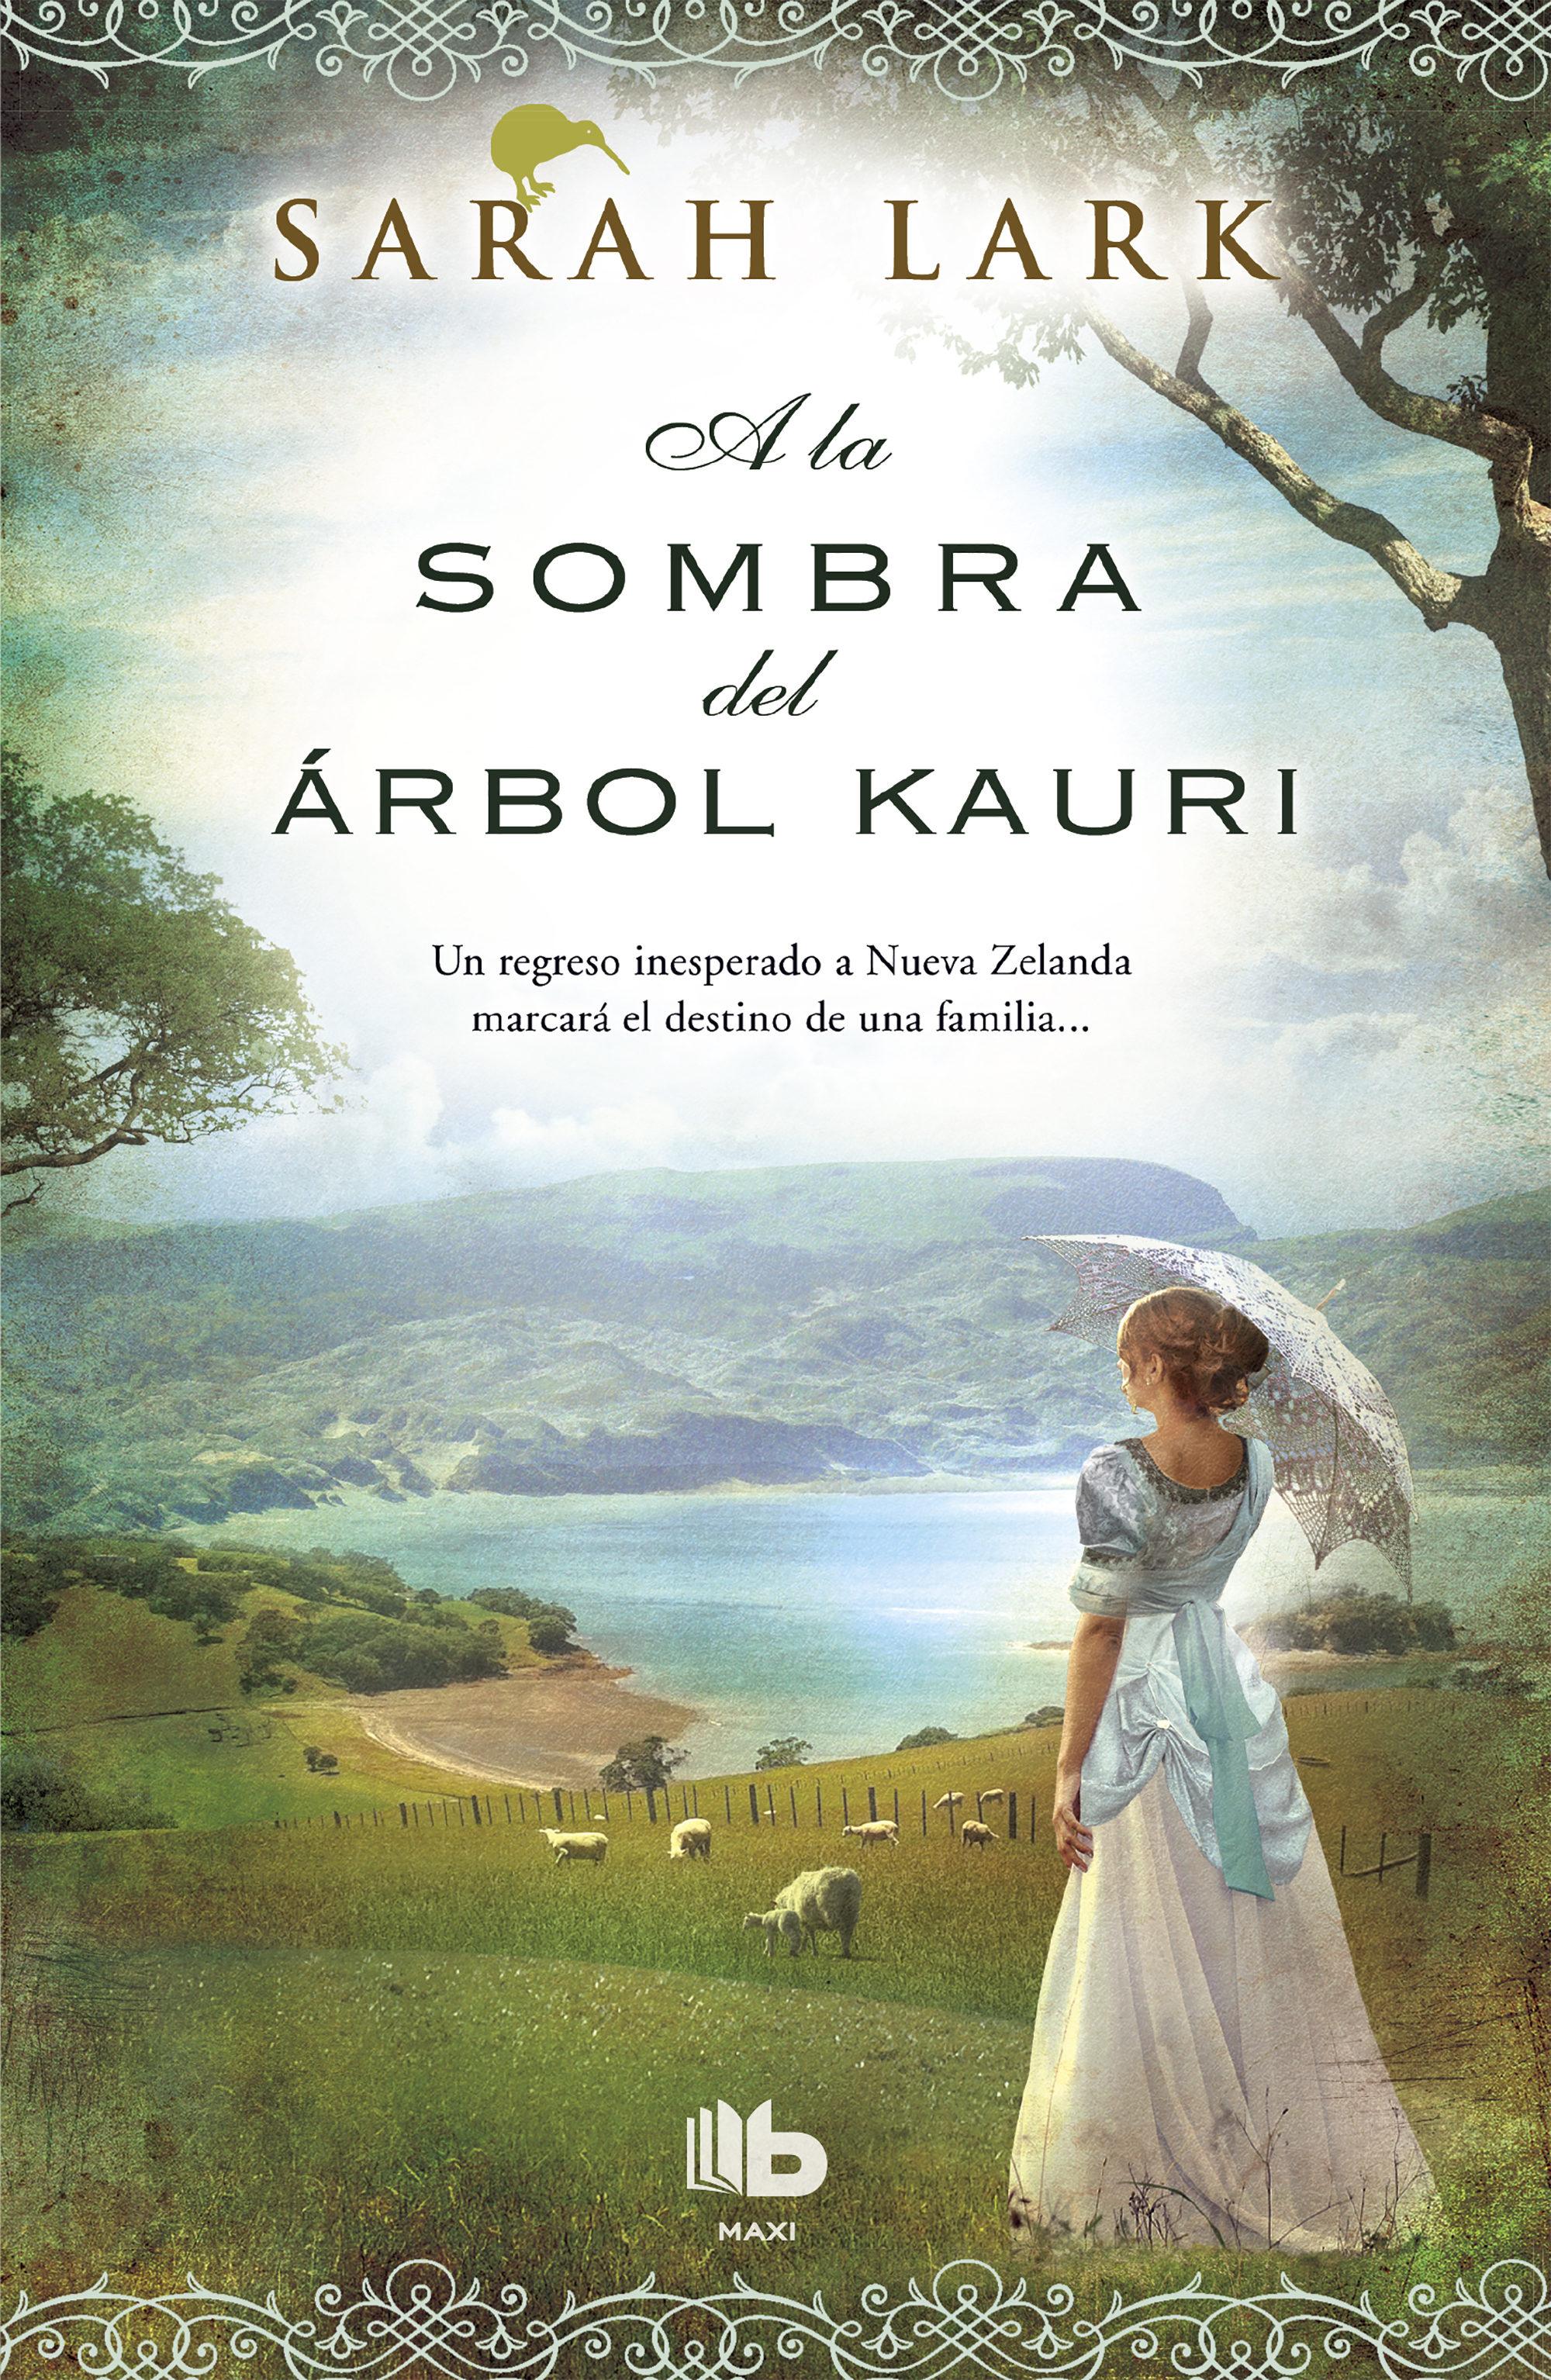 A la Sombra del Árbol Kauri - Sarah Lark - B De Bolsillo